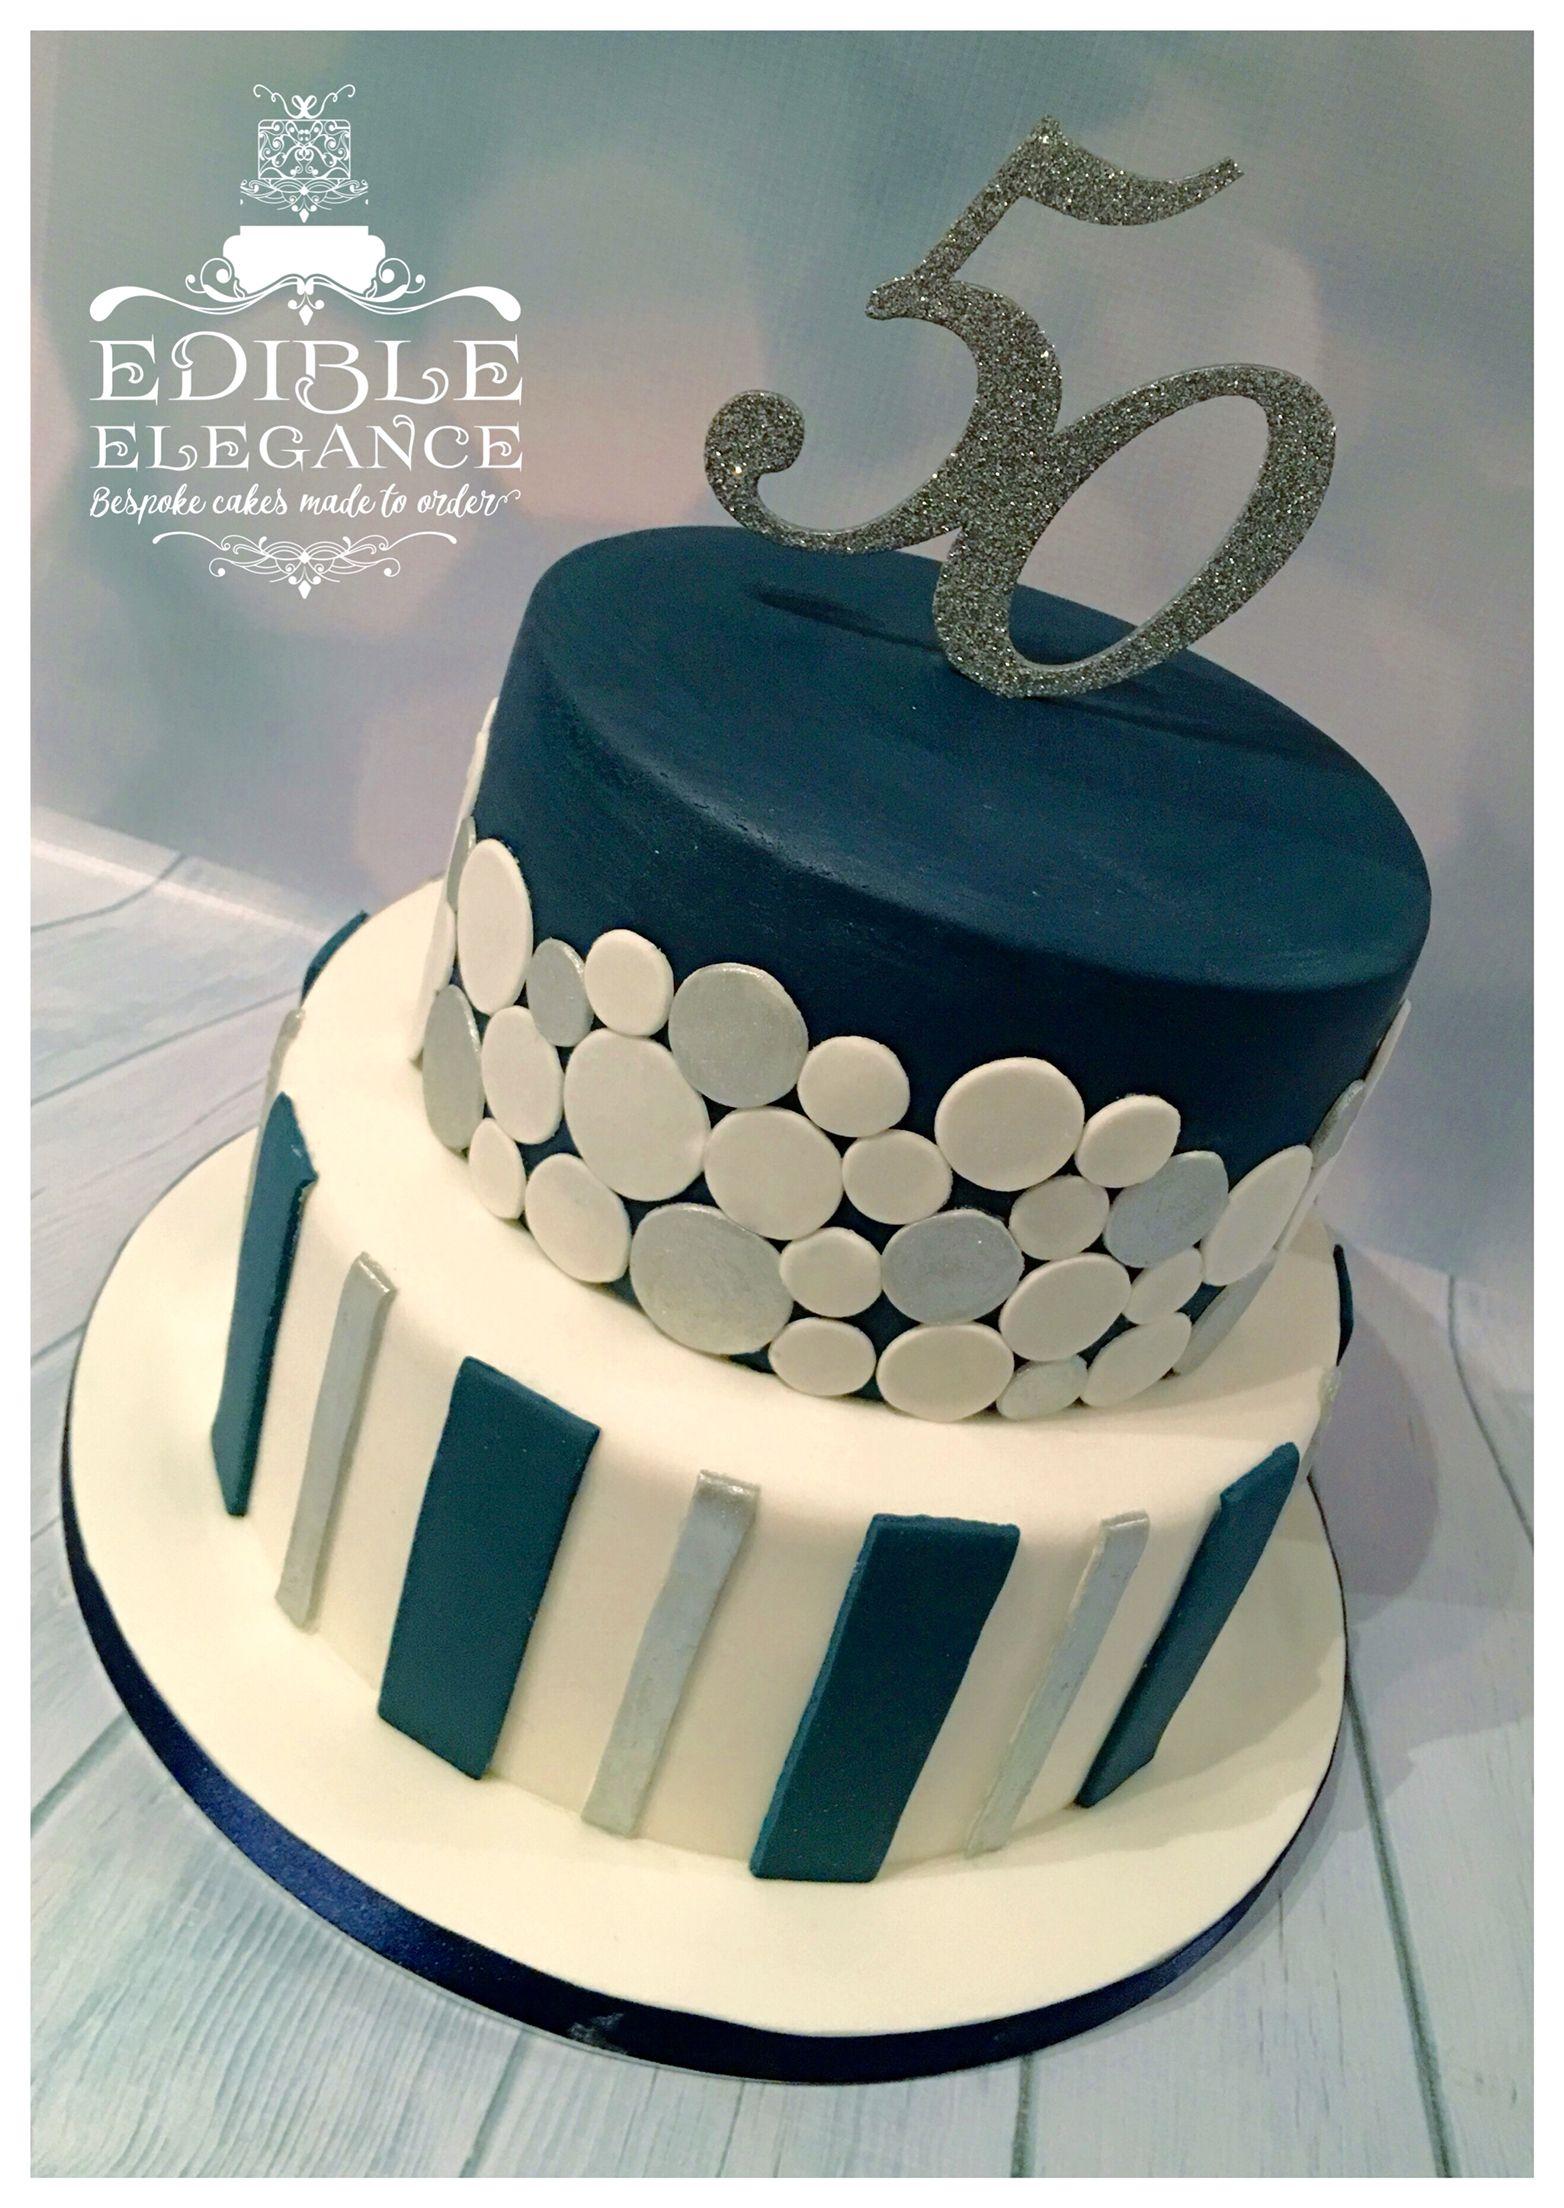 Th Birthday Cake Contemporary Design In Masculine Blue White - 50 birthday cake designs